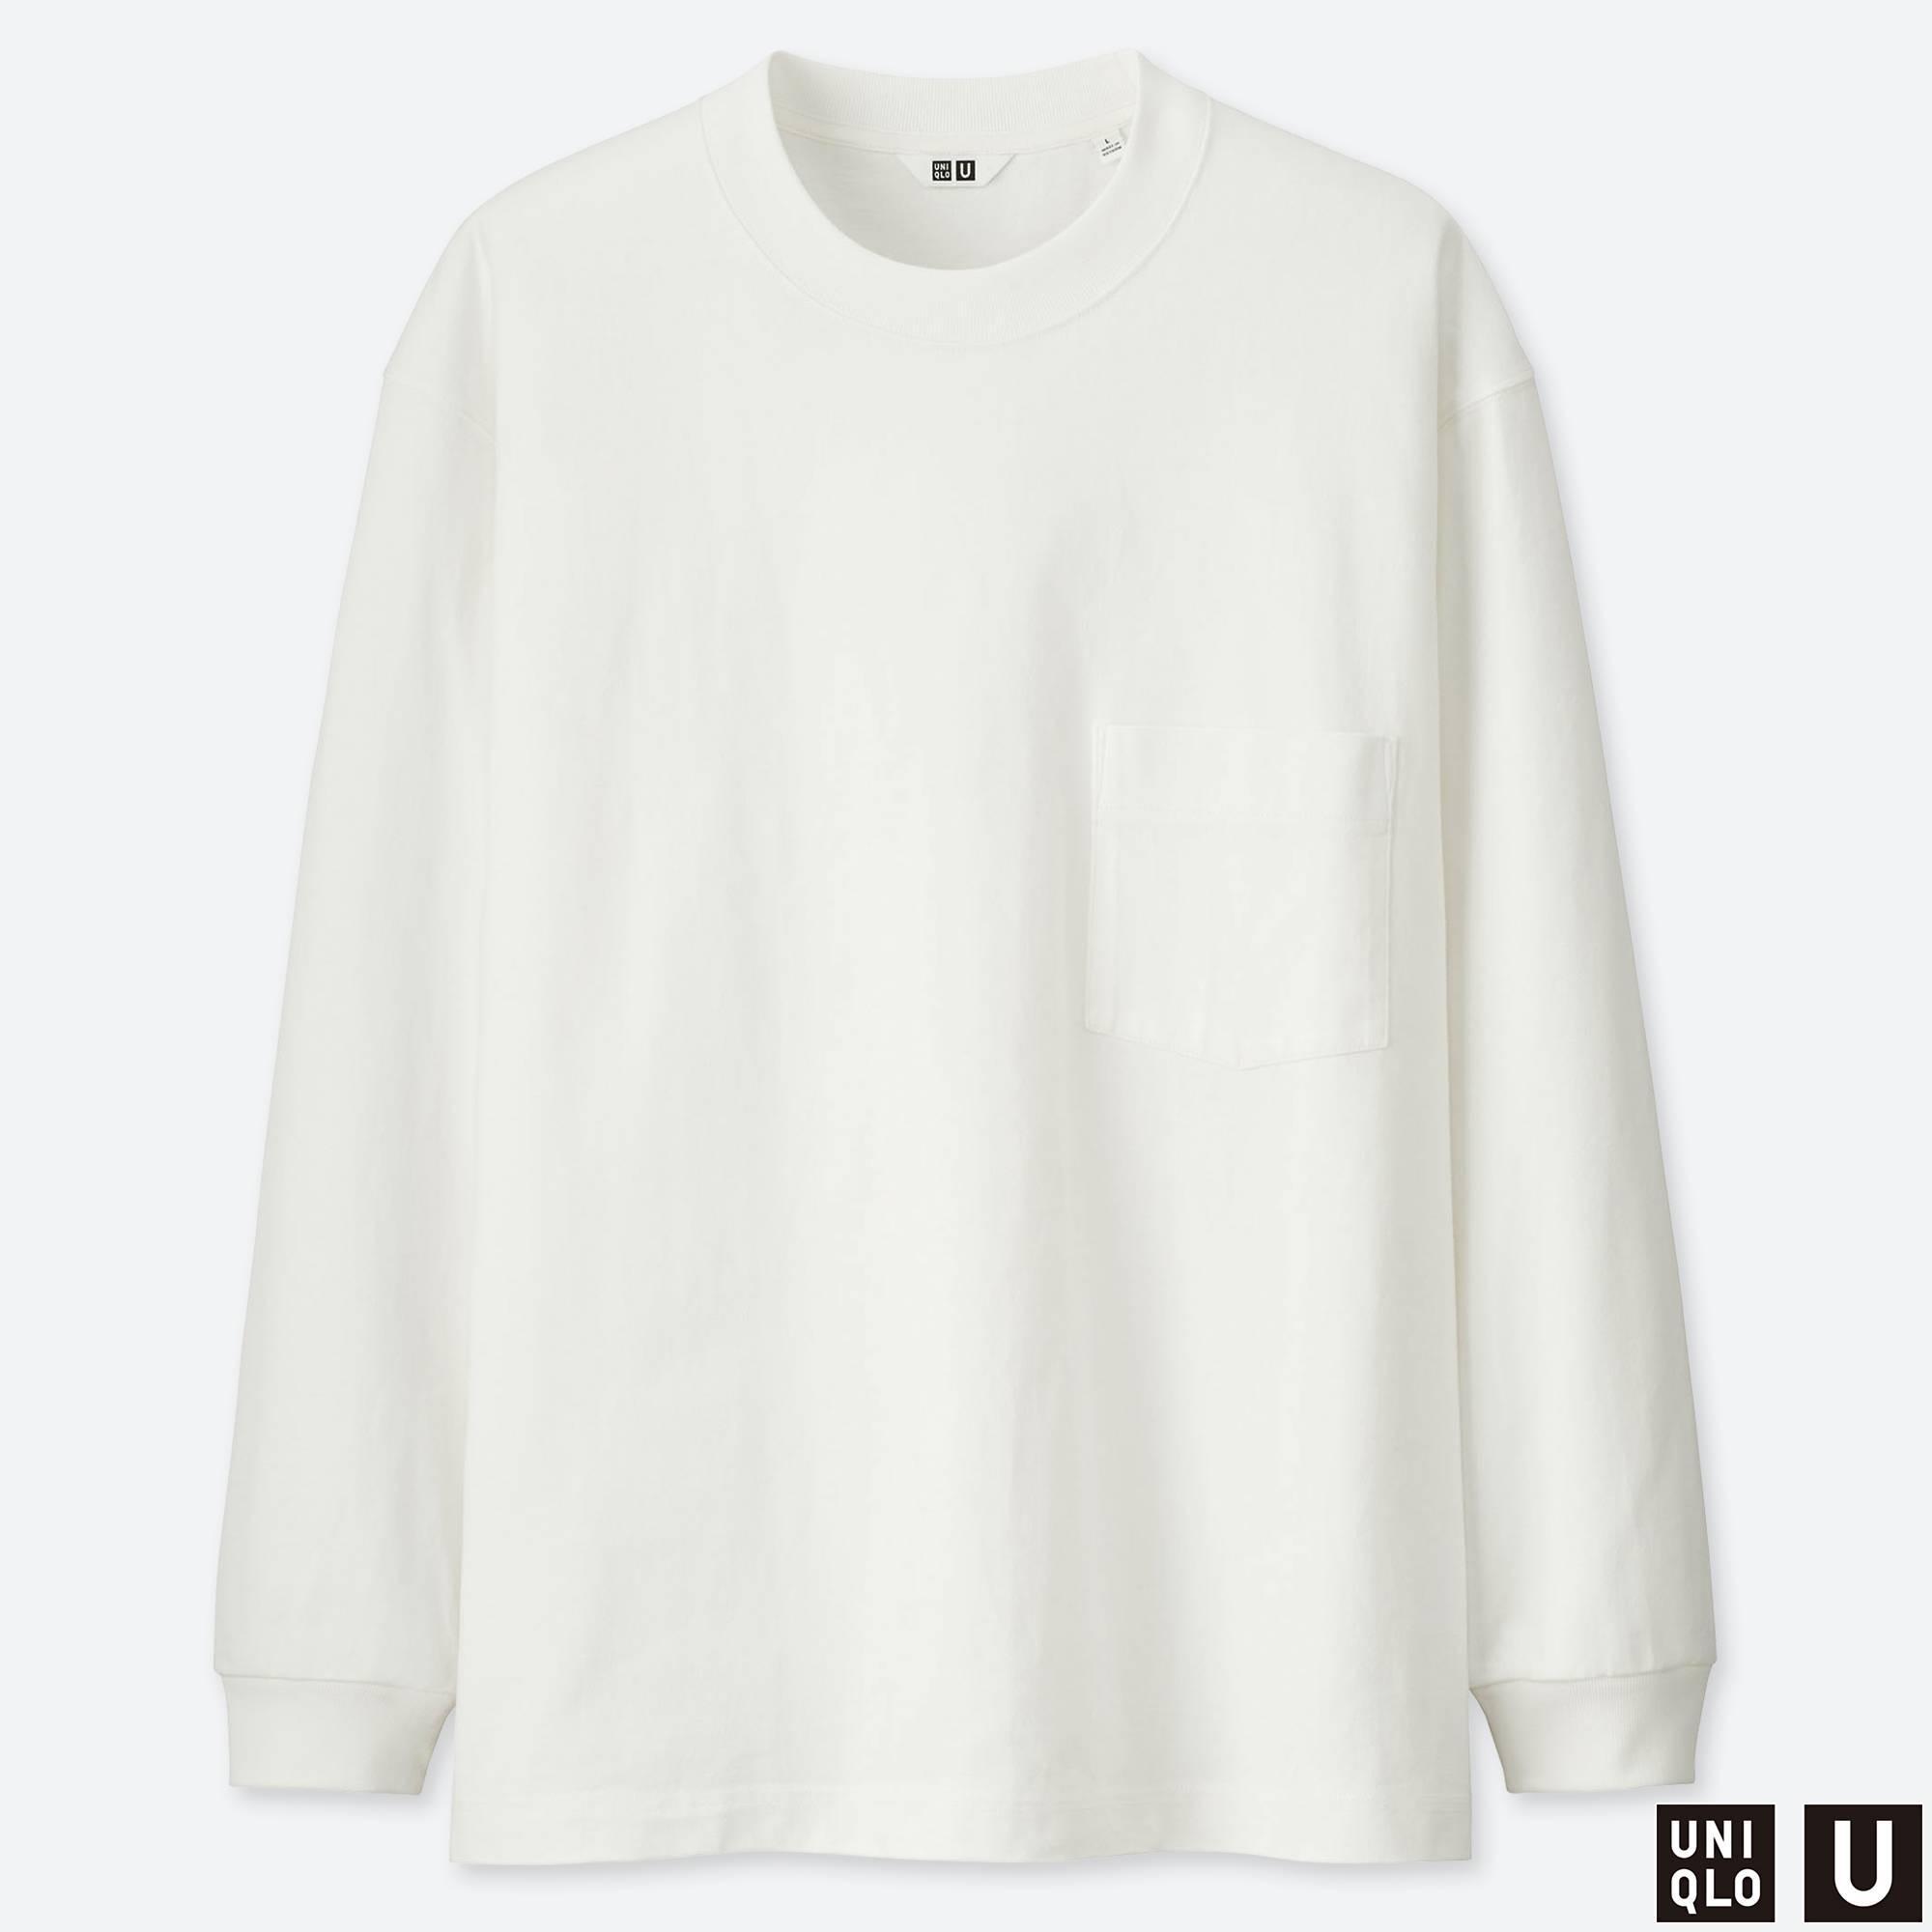 7e77e6e303b9 Lyst - Uniqlo Men U Crew Neck Long-sleeve T-shirt in White for Men